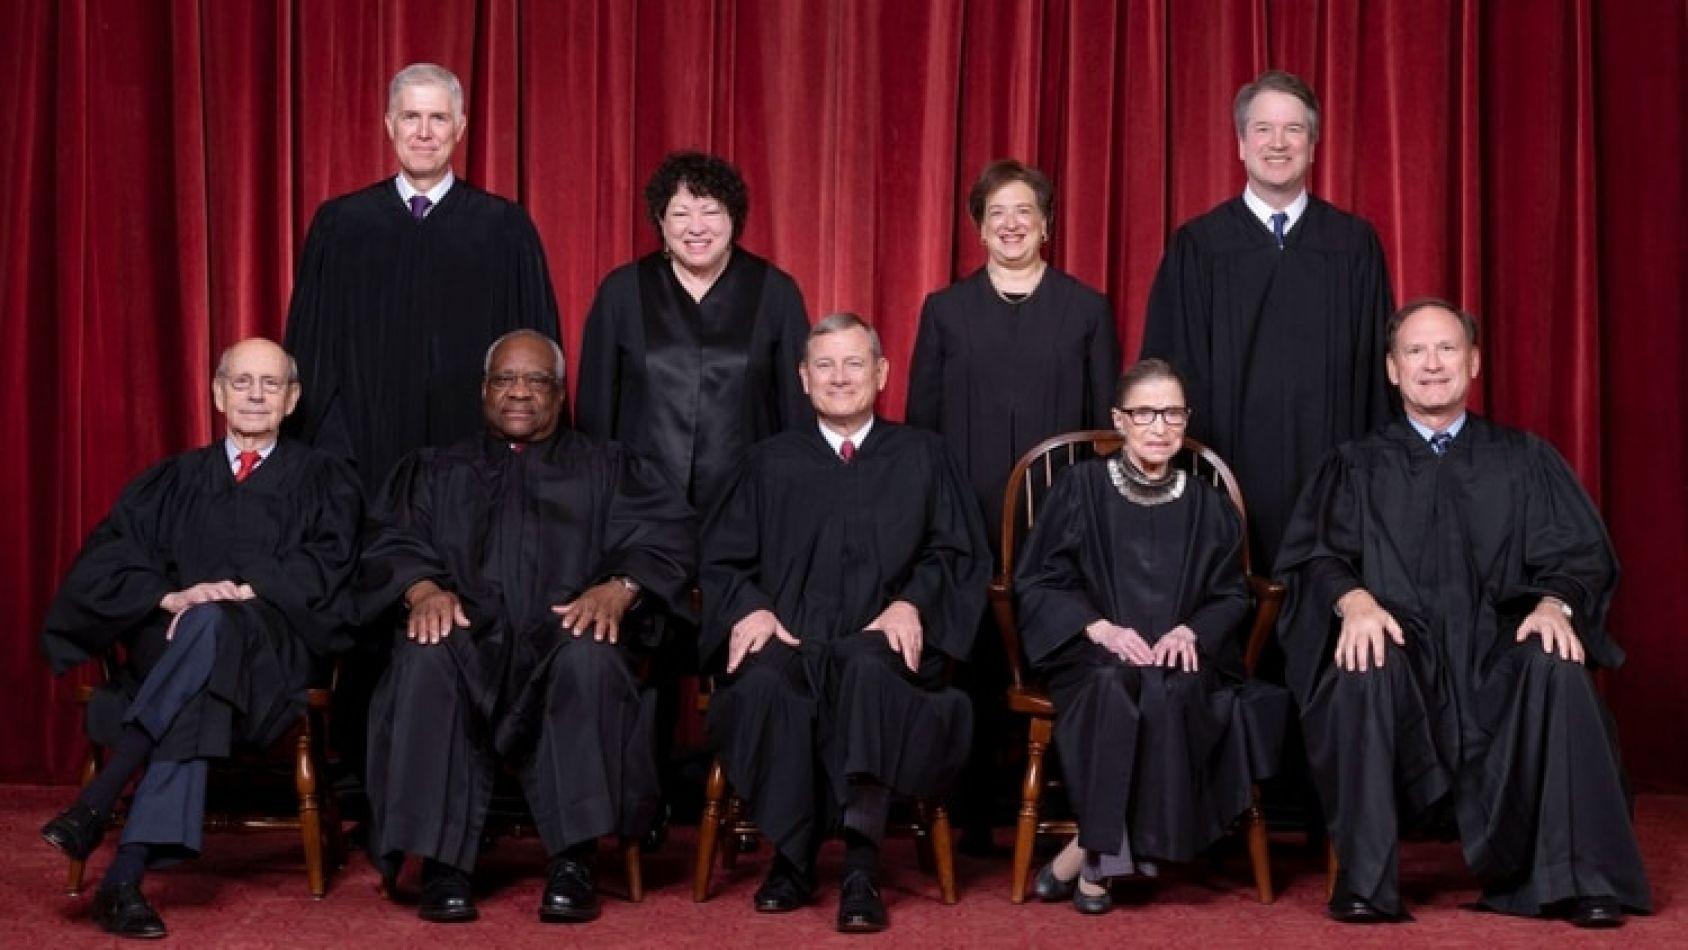 Los nueve jueces de la Corte de EEUU (Fred Schilling, Collection of the Supreme Court of the United States)